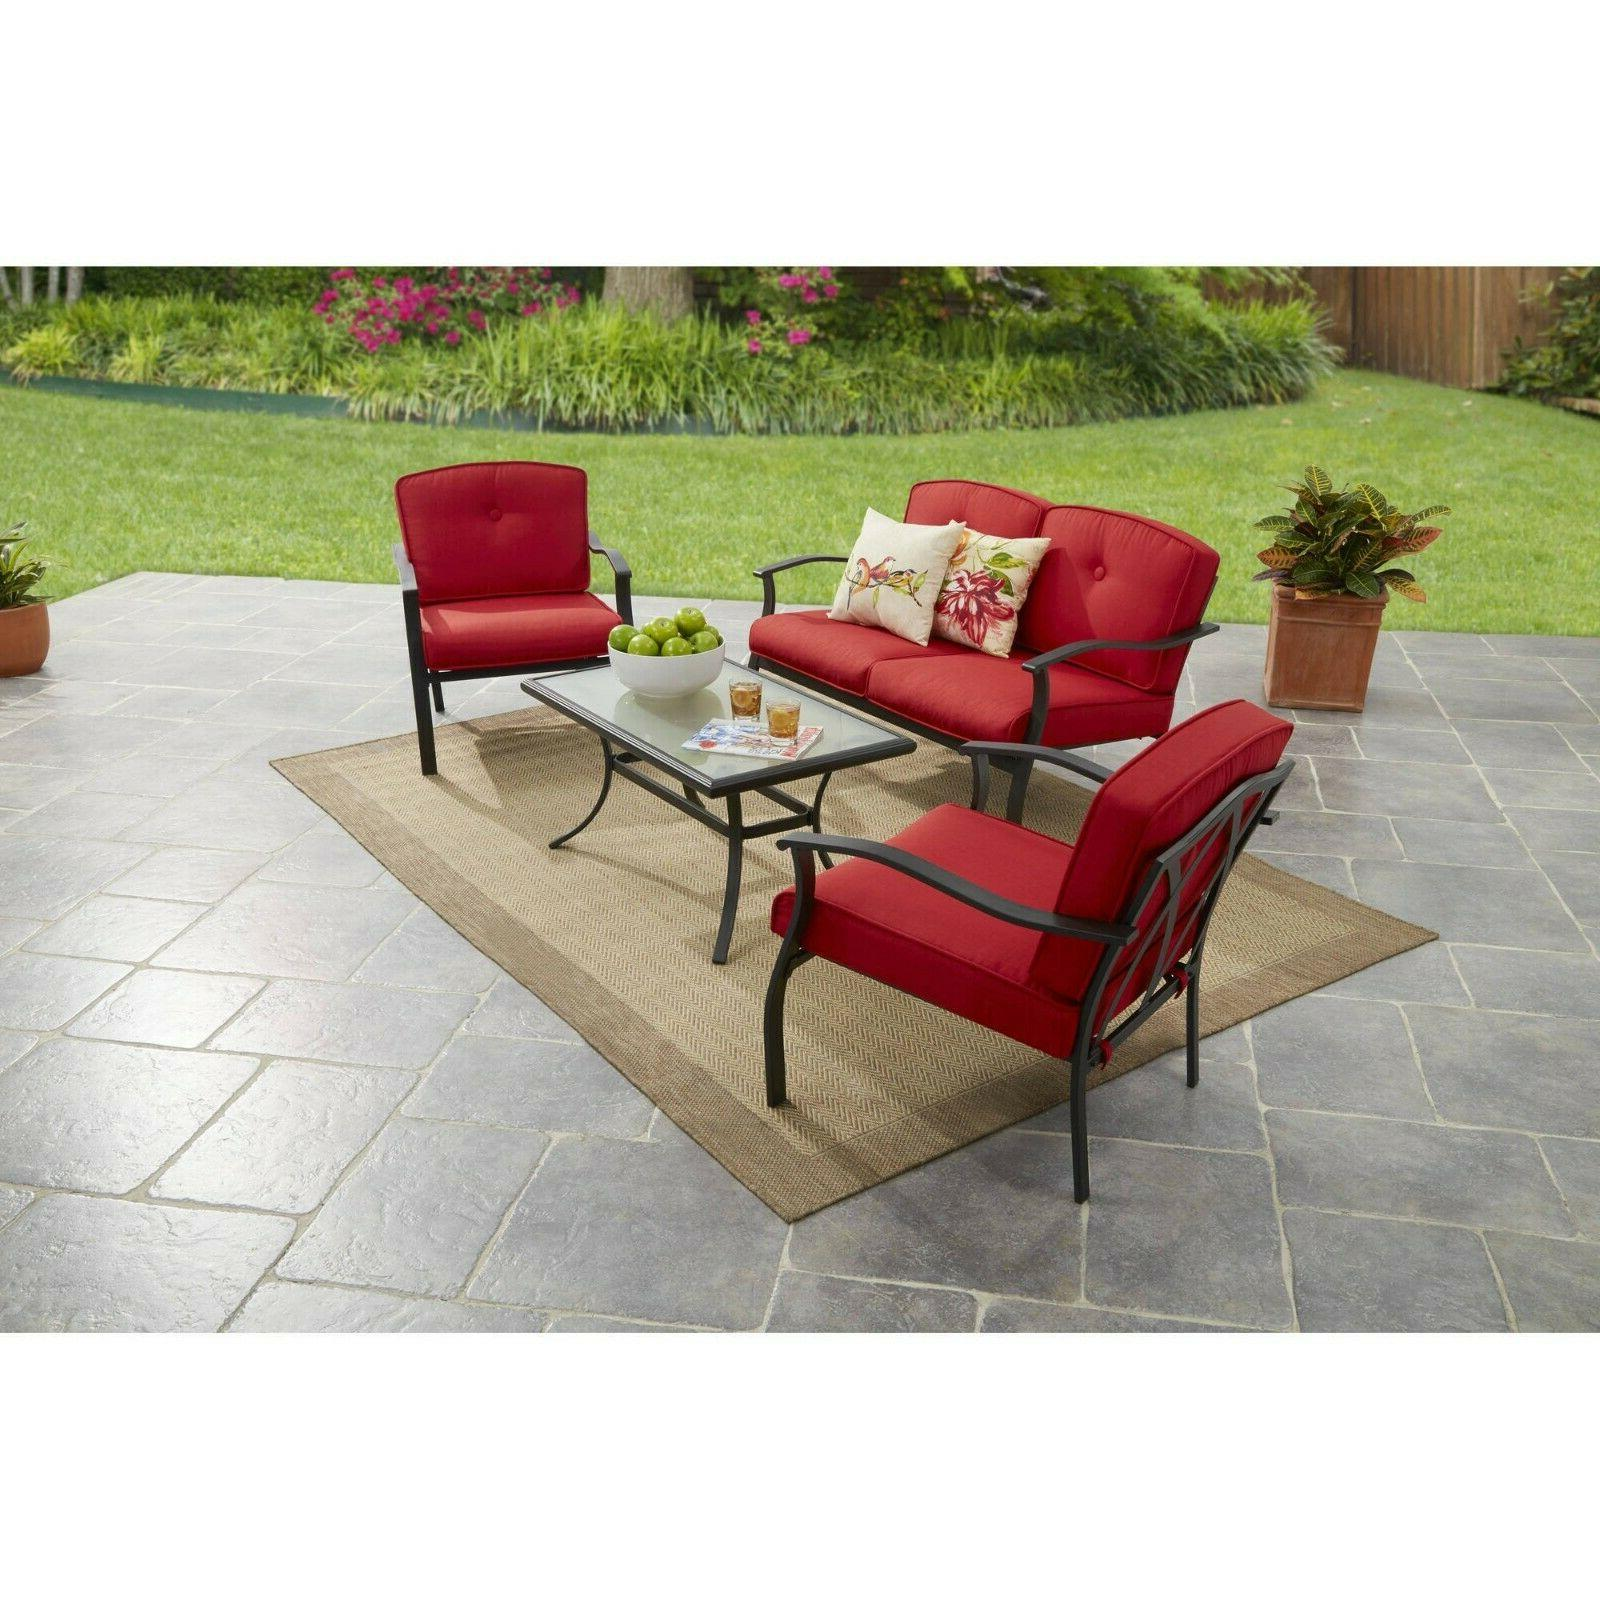 Patio Conversation Set Outdoor Furniture Sets For Backyard G